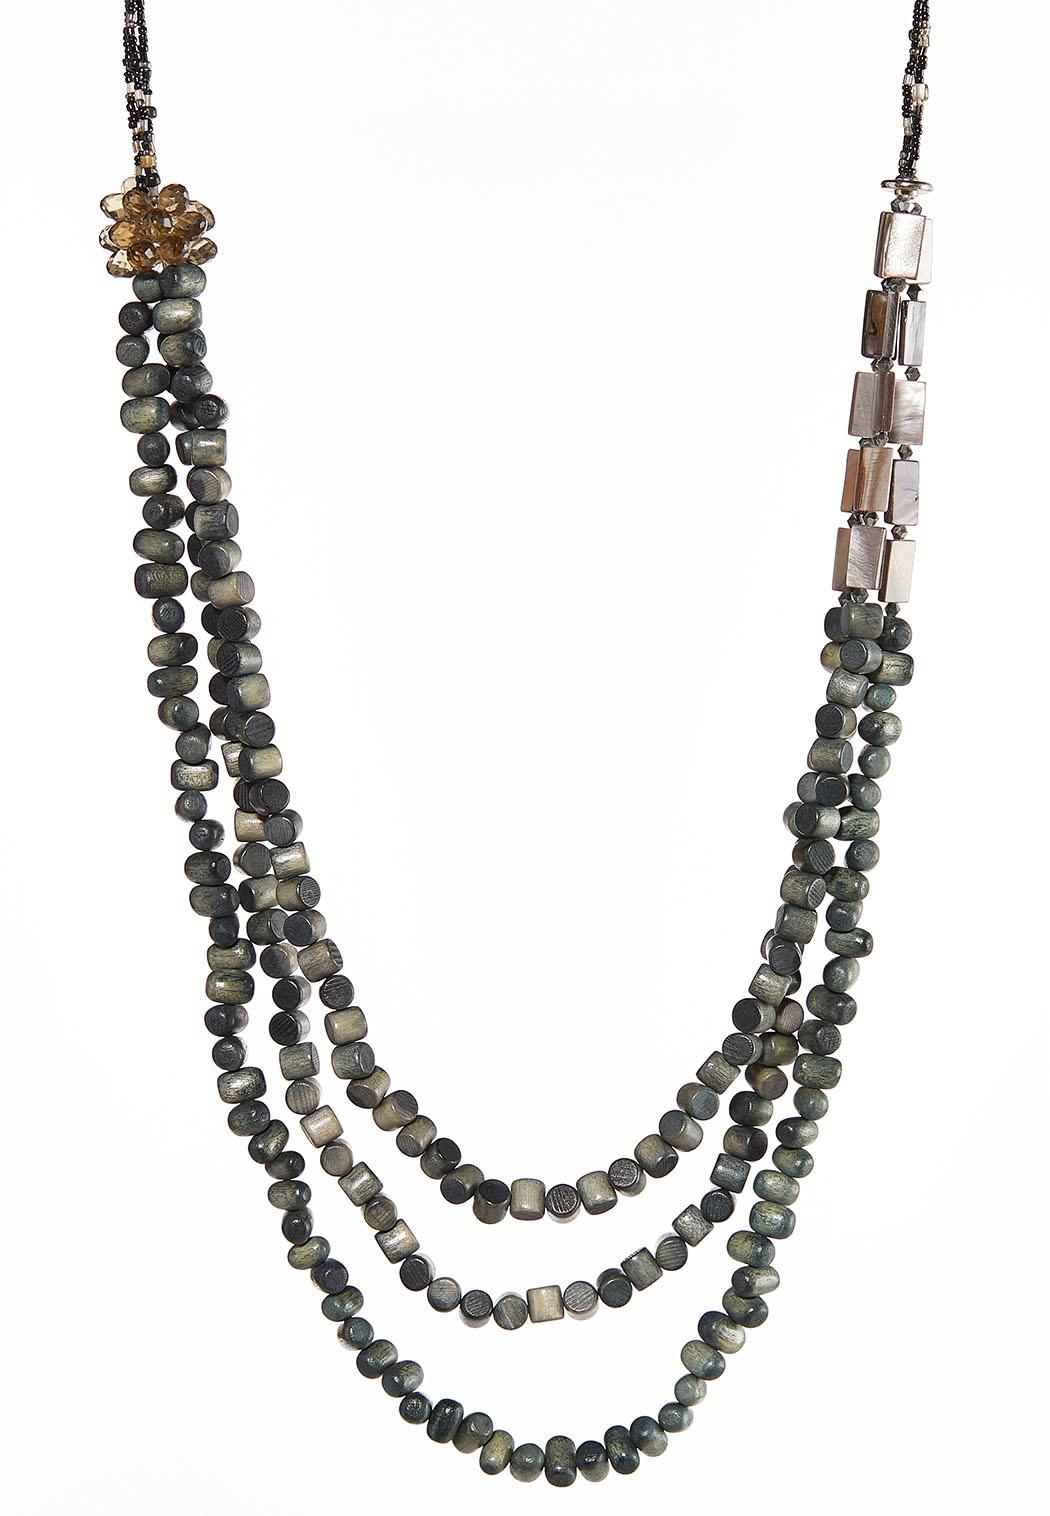 Wondrous Wooden Bead Necklace